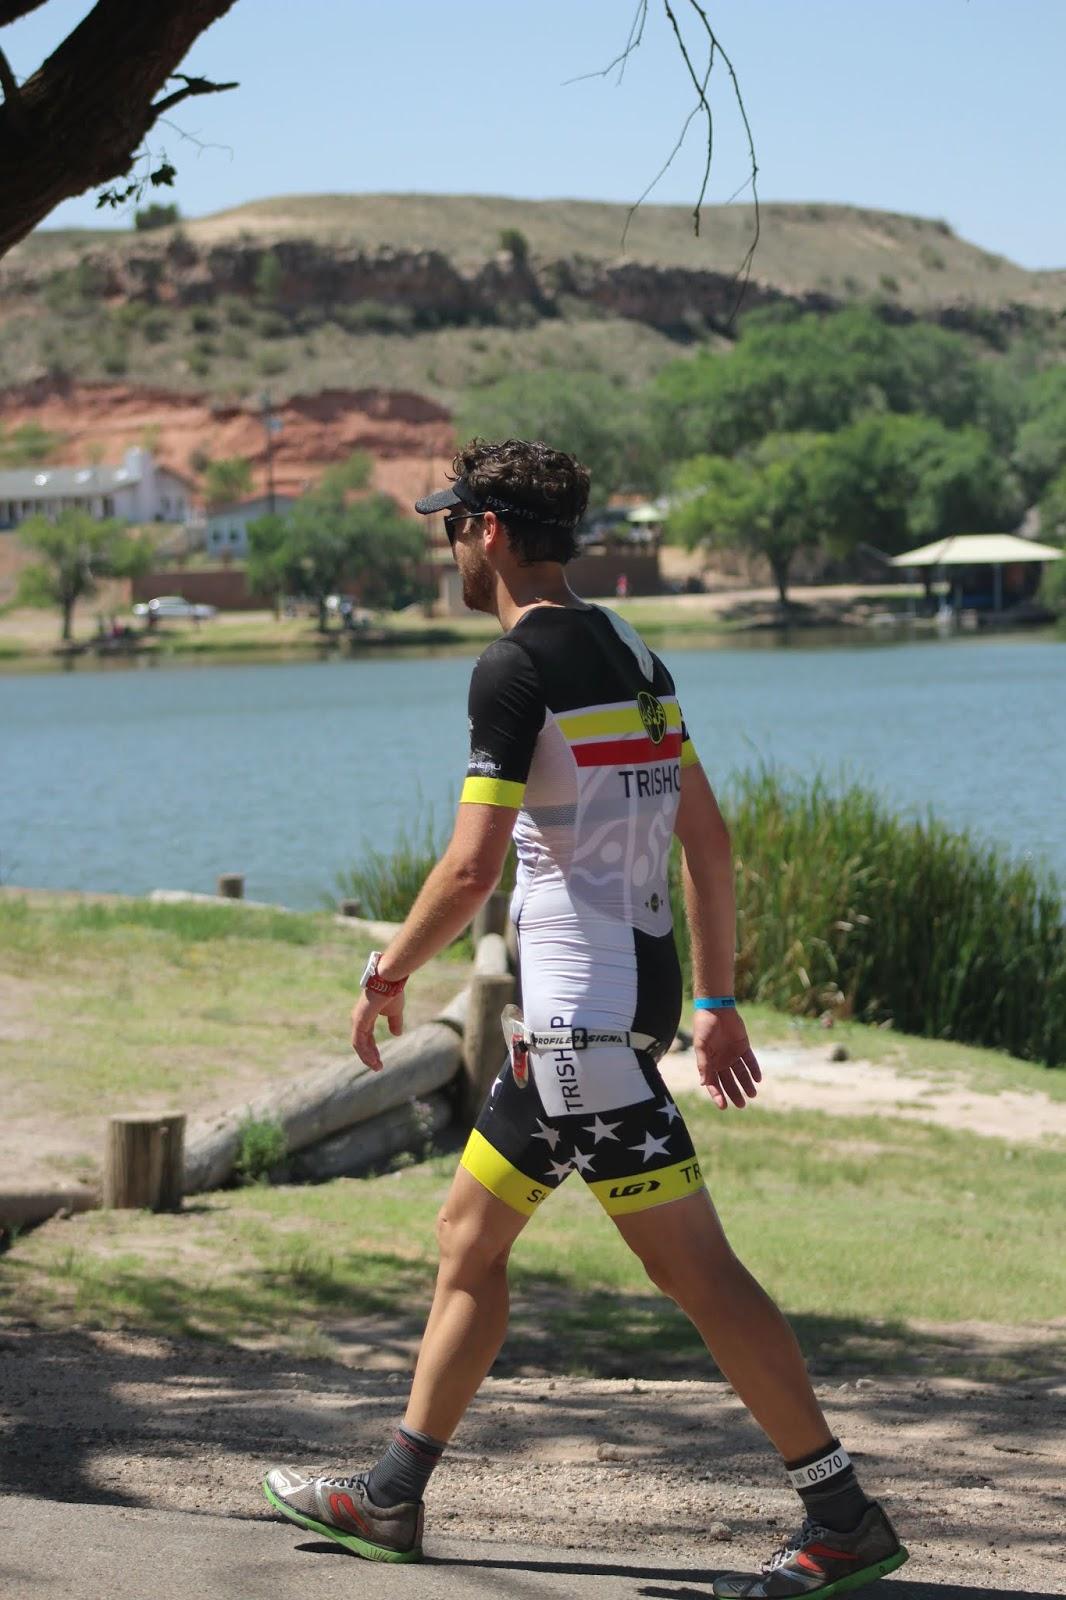 Coach_Terry_Wilson_Pursuit_of_The_Perfect_Race_IRONMAN_Buffalo_Springs_Lake_70.3_Avram_Carter_Walk.JPG